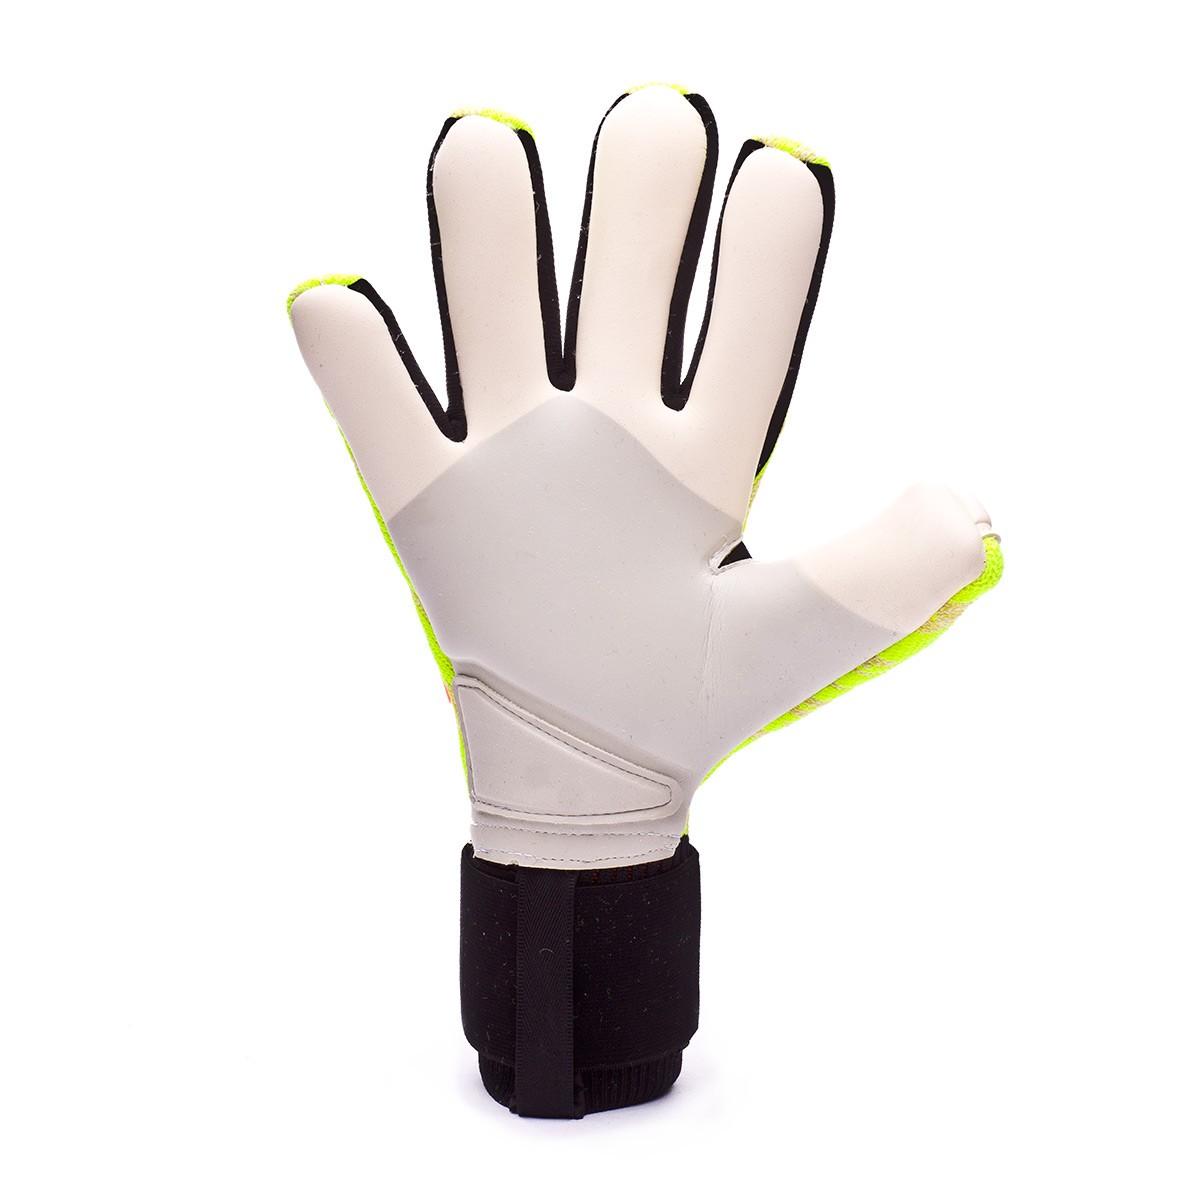 86e933f4ecf1 ... netherlands glove adidas predator pro solar yellow solar red black  leaked soccer 0ead9 f8ff1